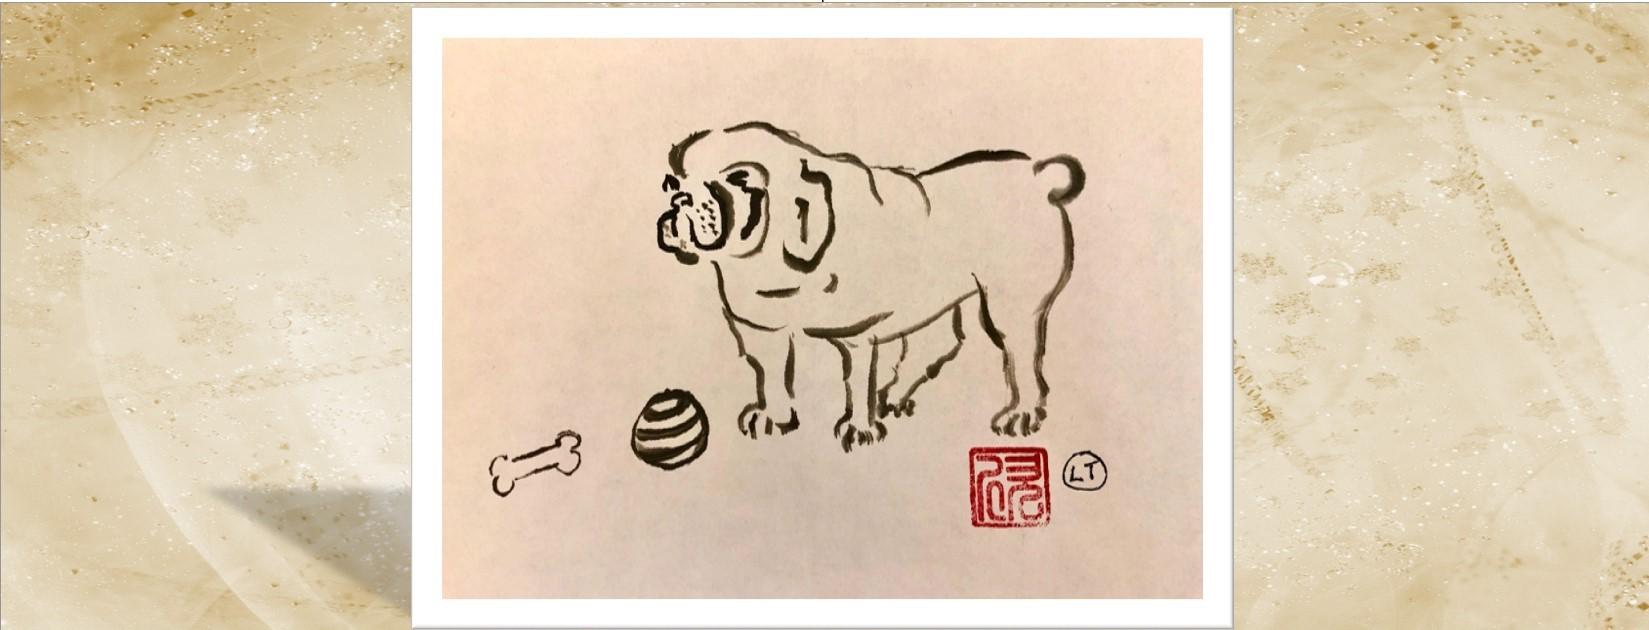 Year of the Dog, Linda Tomchuck